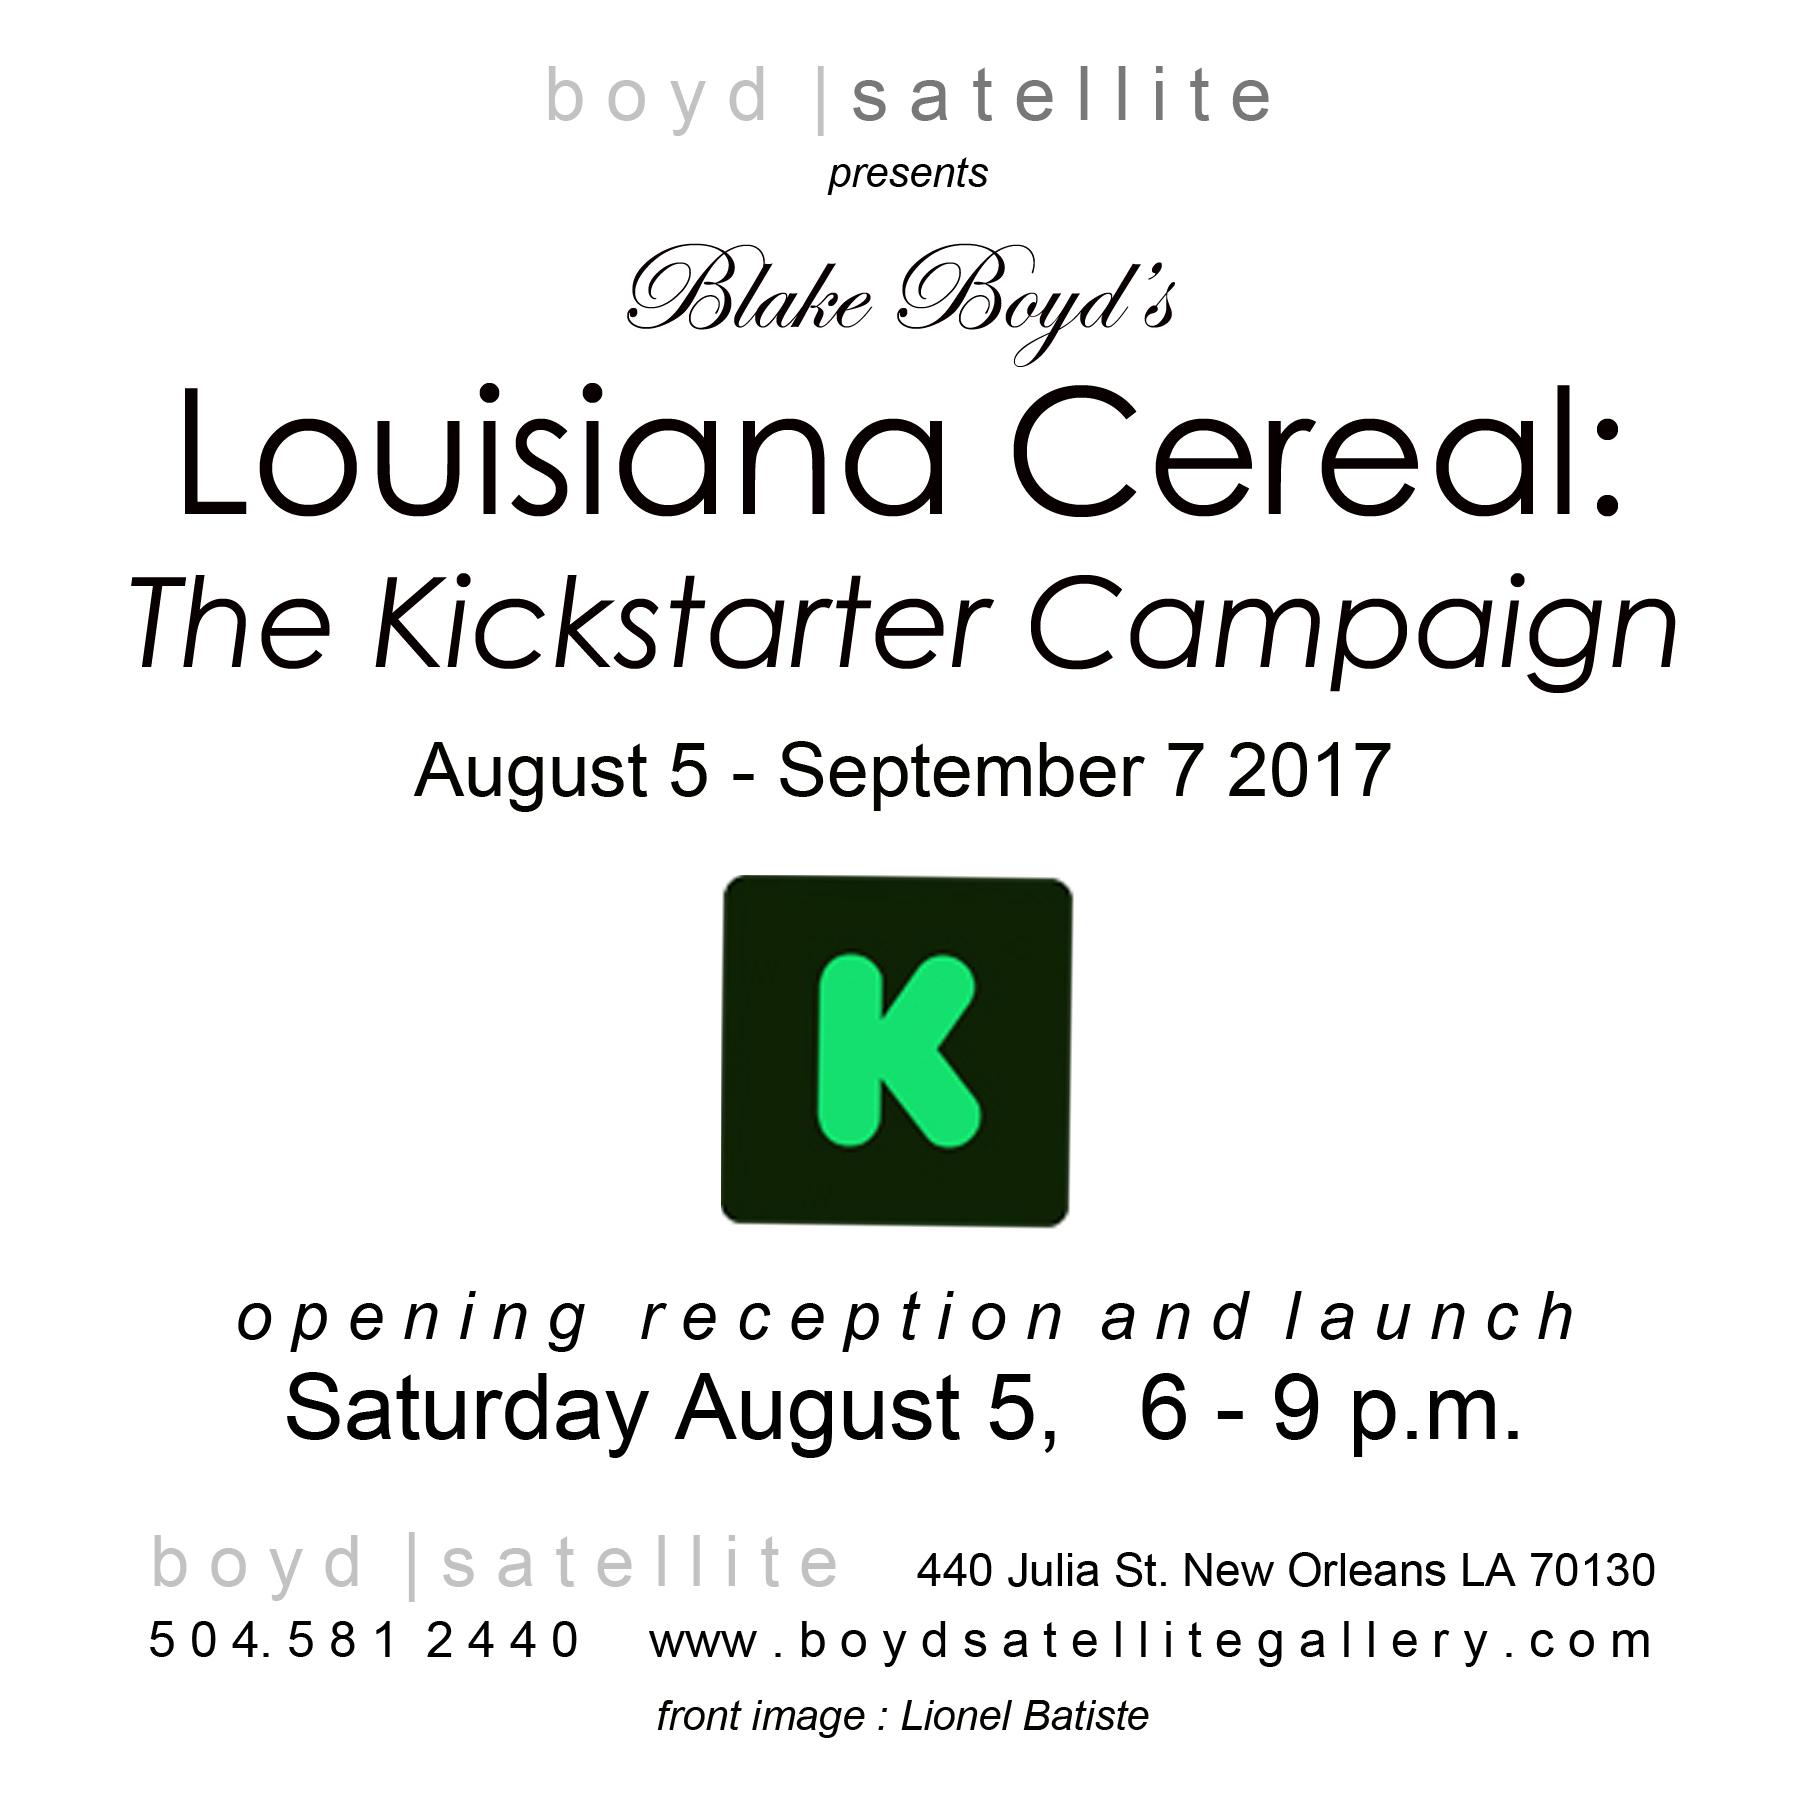 louisiana cereal-the kickstarter rear.jpg